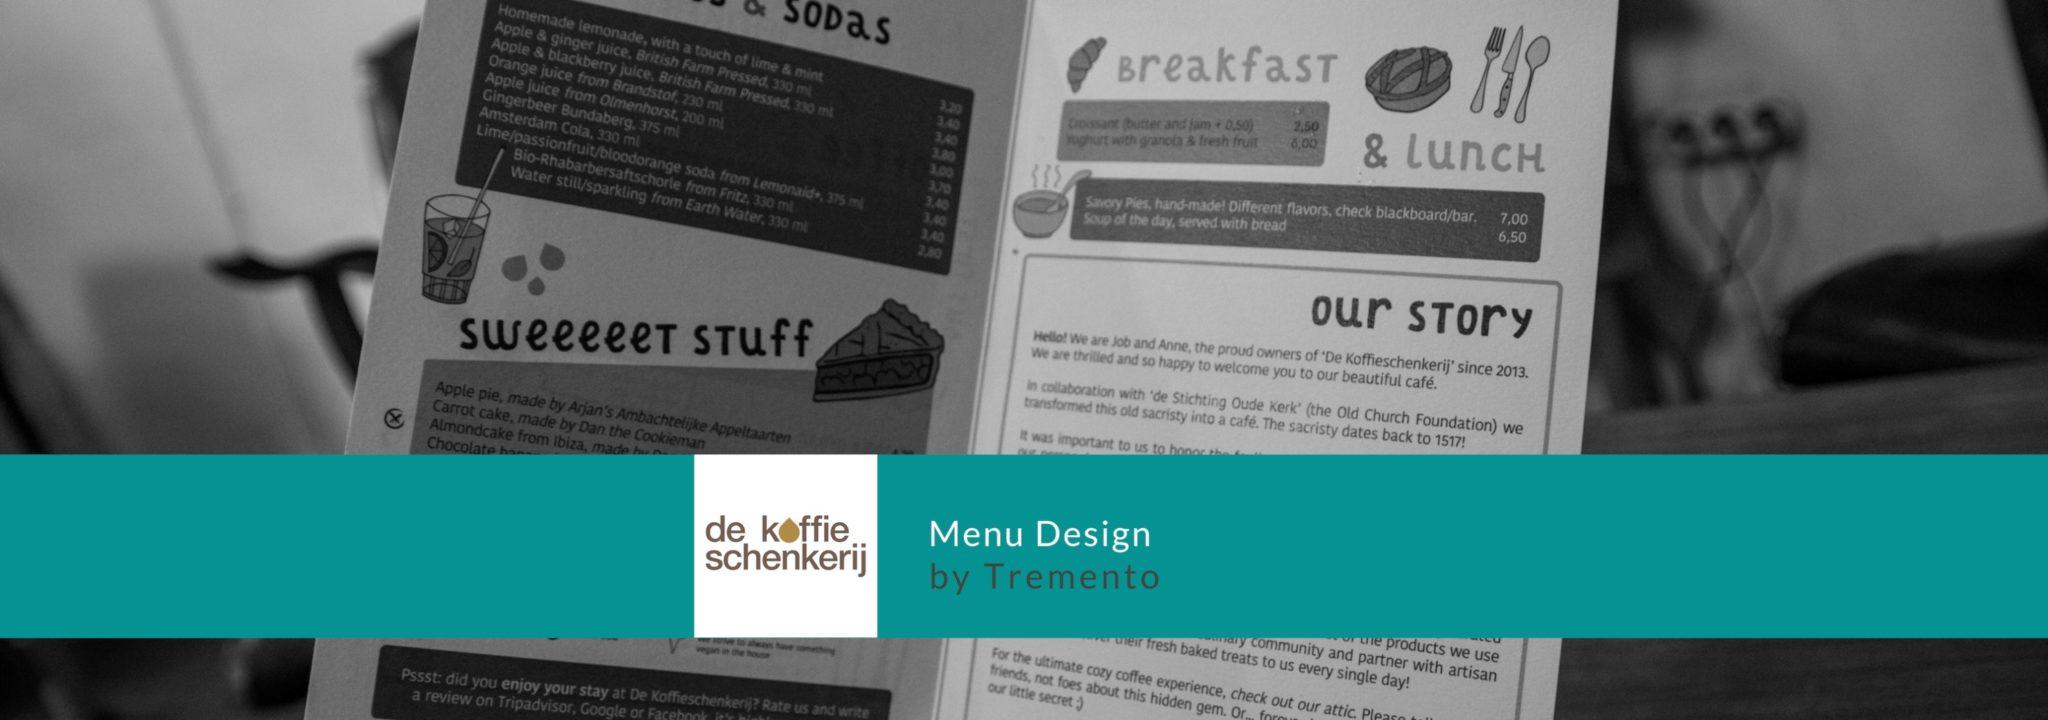 Tremento Portfolio - Menu Design - De Koffieschenkerij